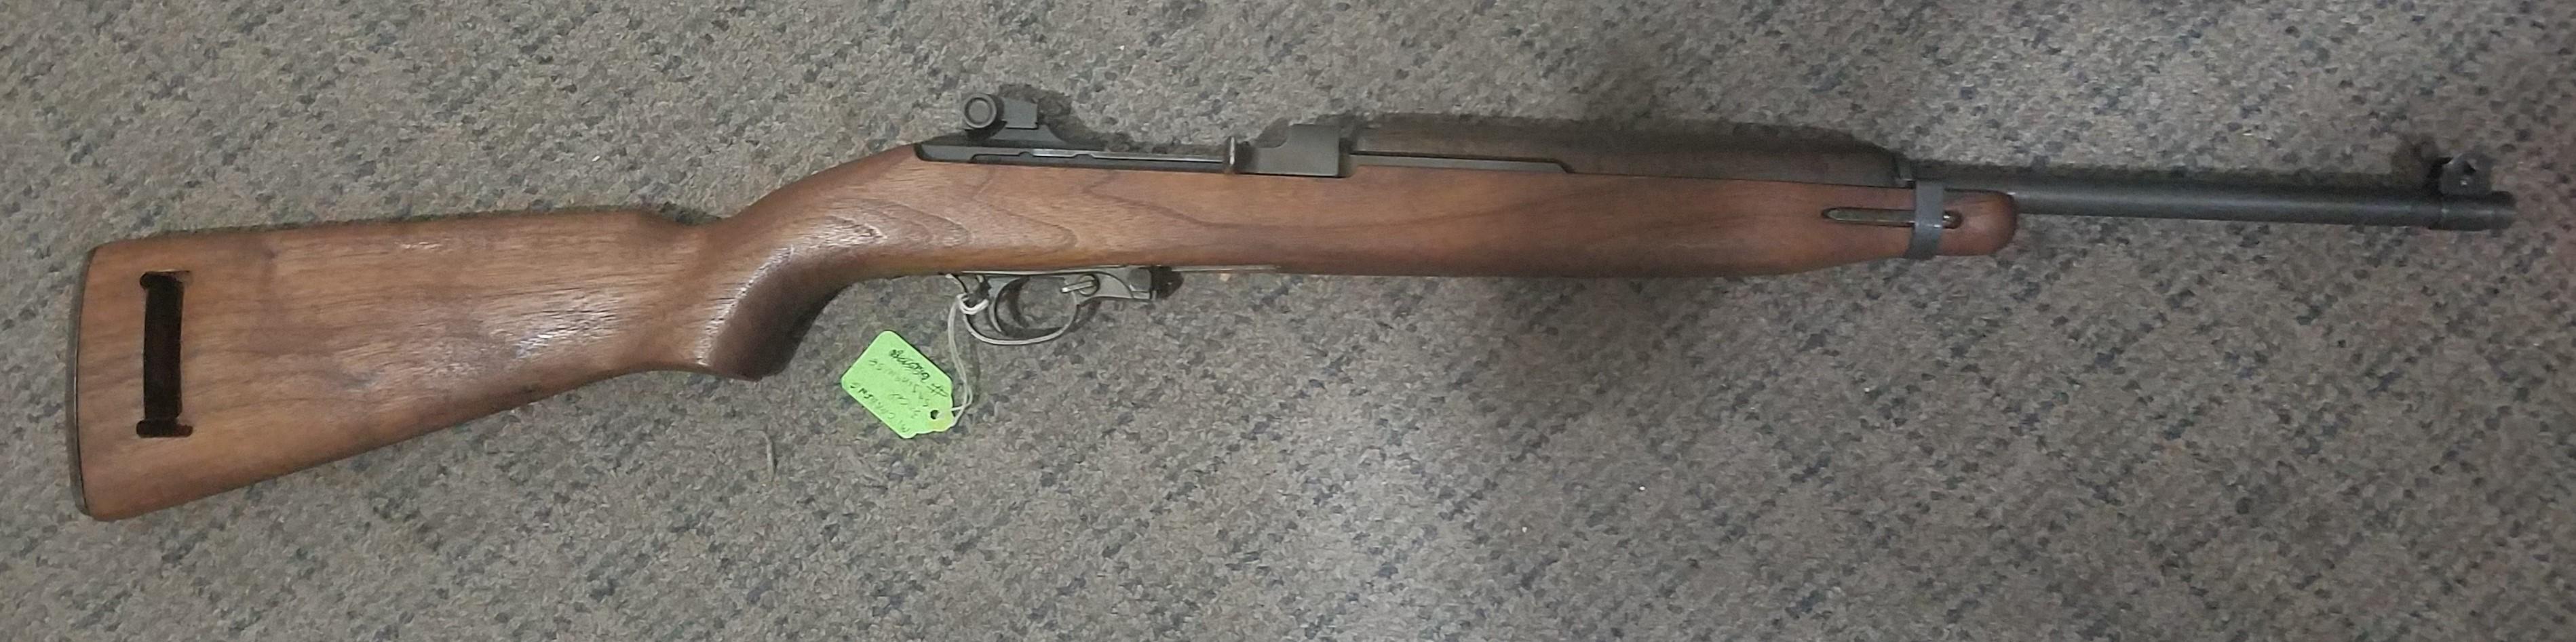 WTS:  M1 Carbines-20190206_165030.jpg